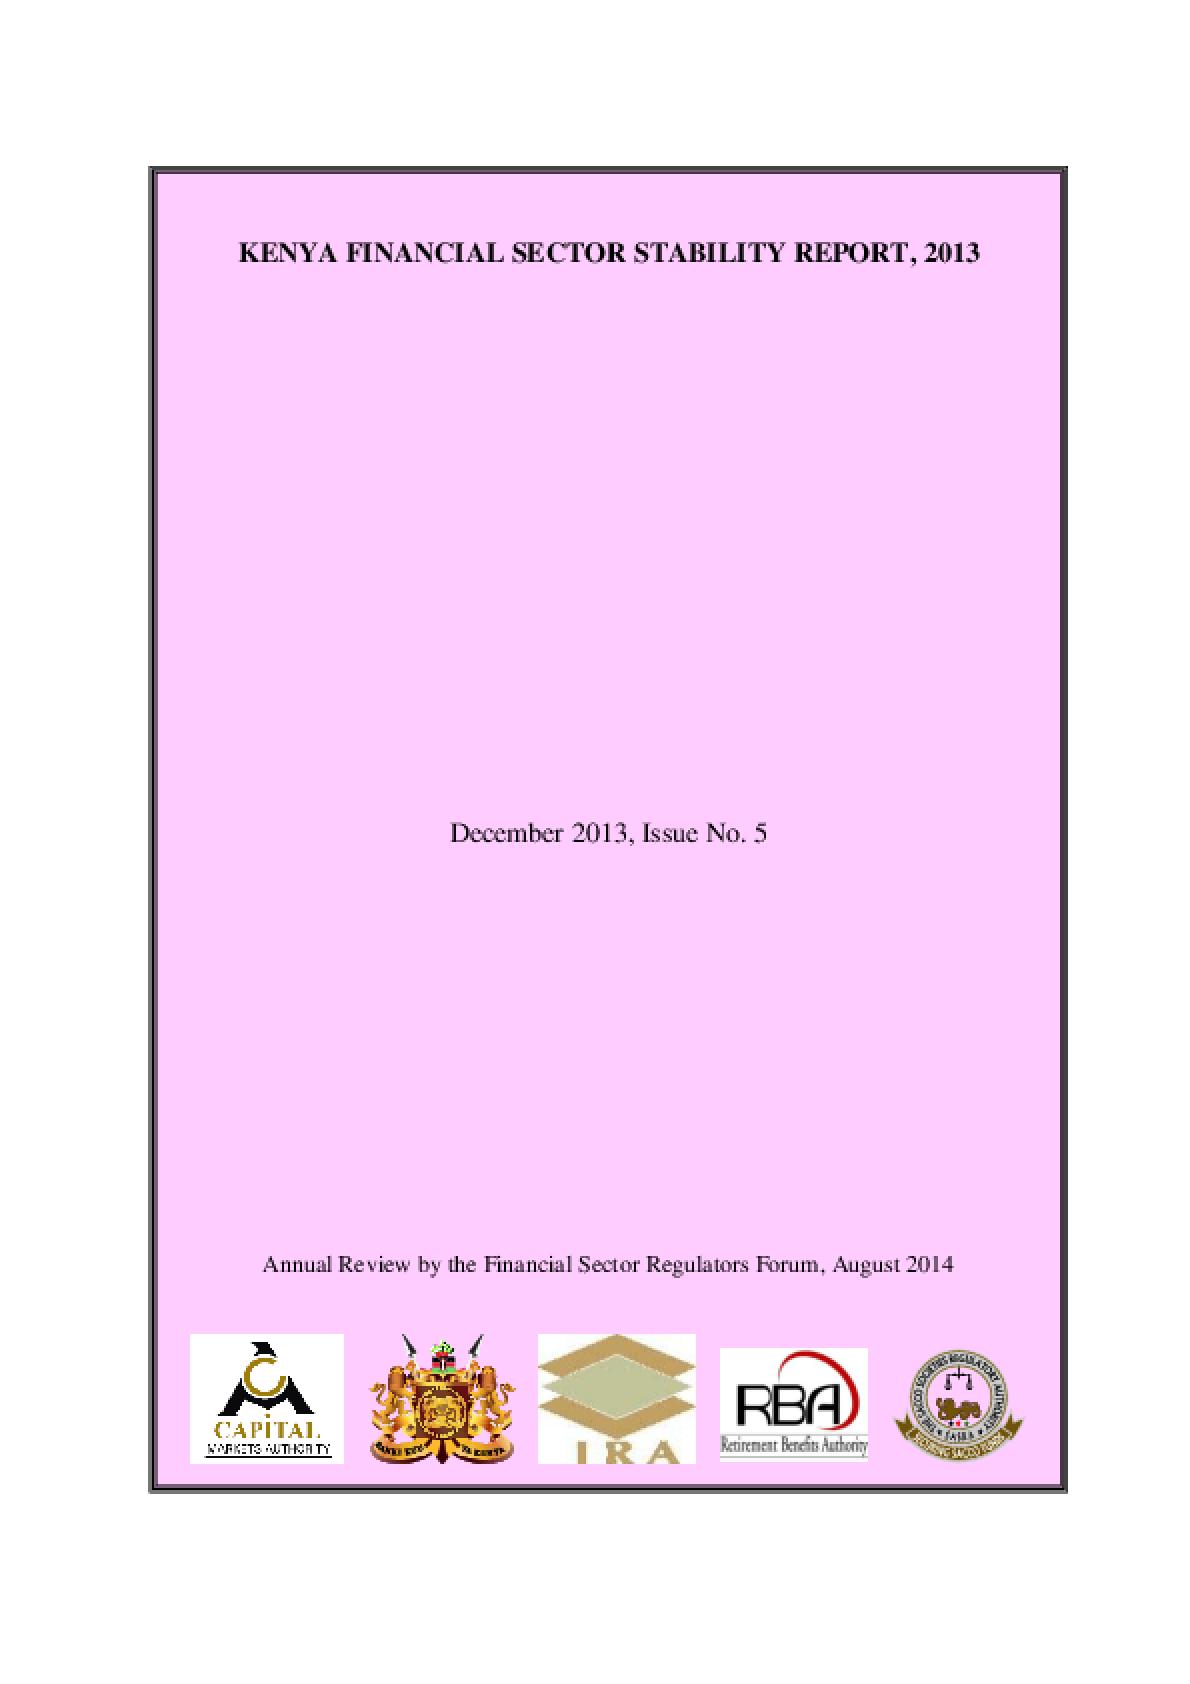 Kenya Financial Sector Stability Report, 2013